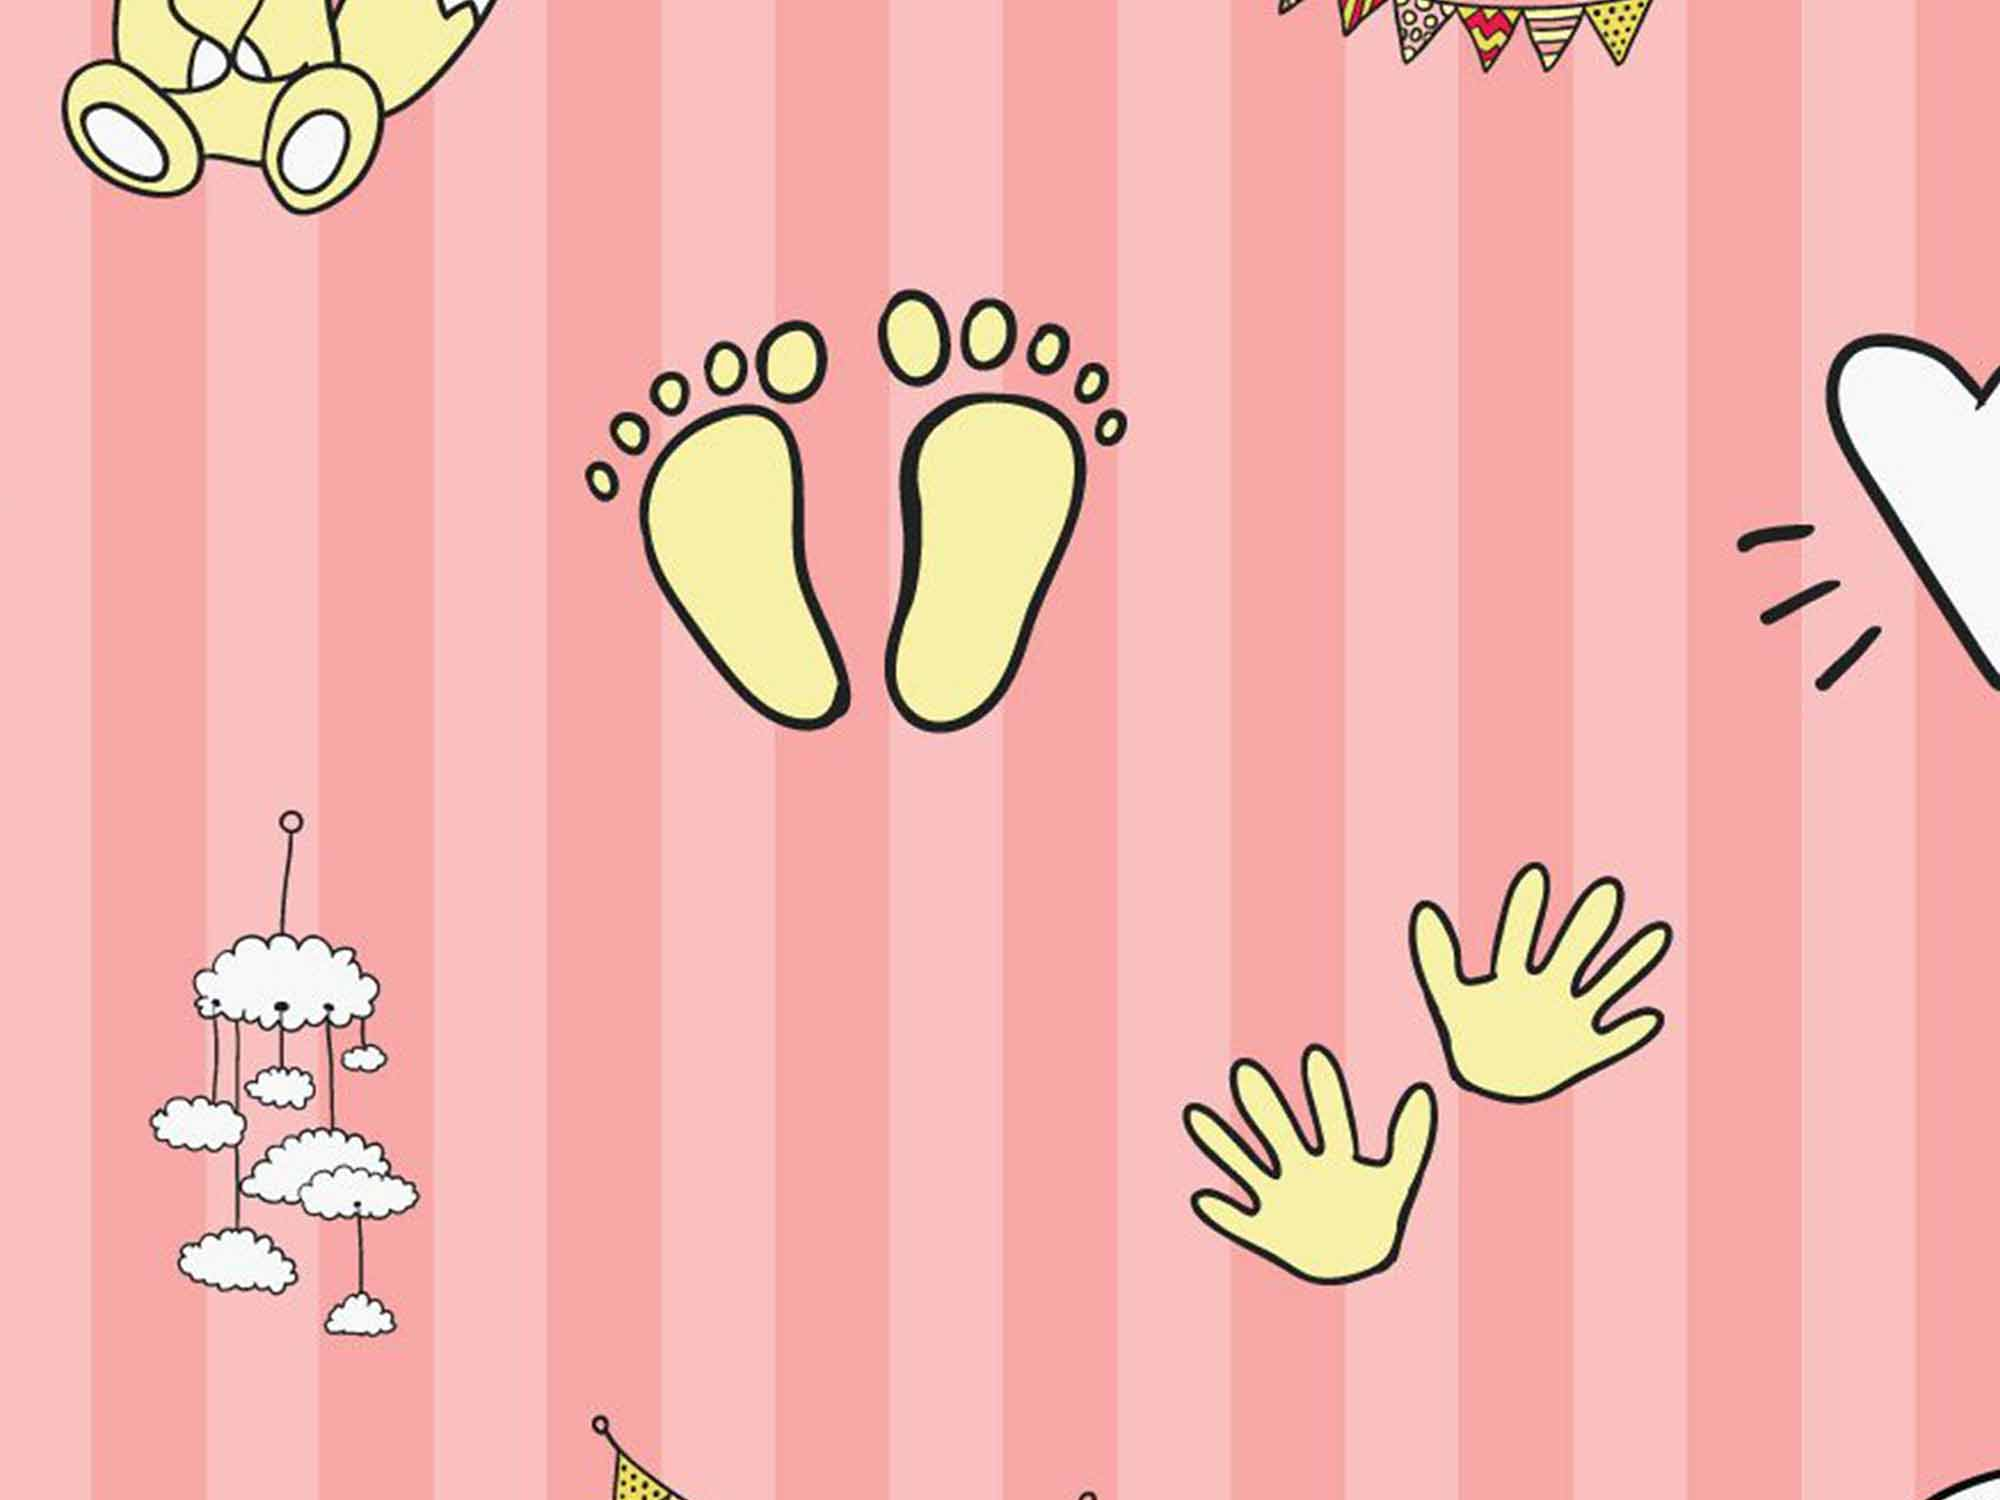 Papel de Parede Infantil 0045 - Adesivos de Parede  - Paredes Decoradas